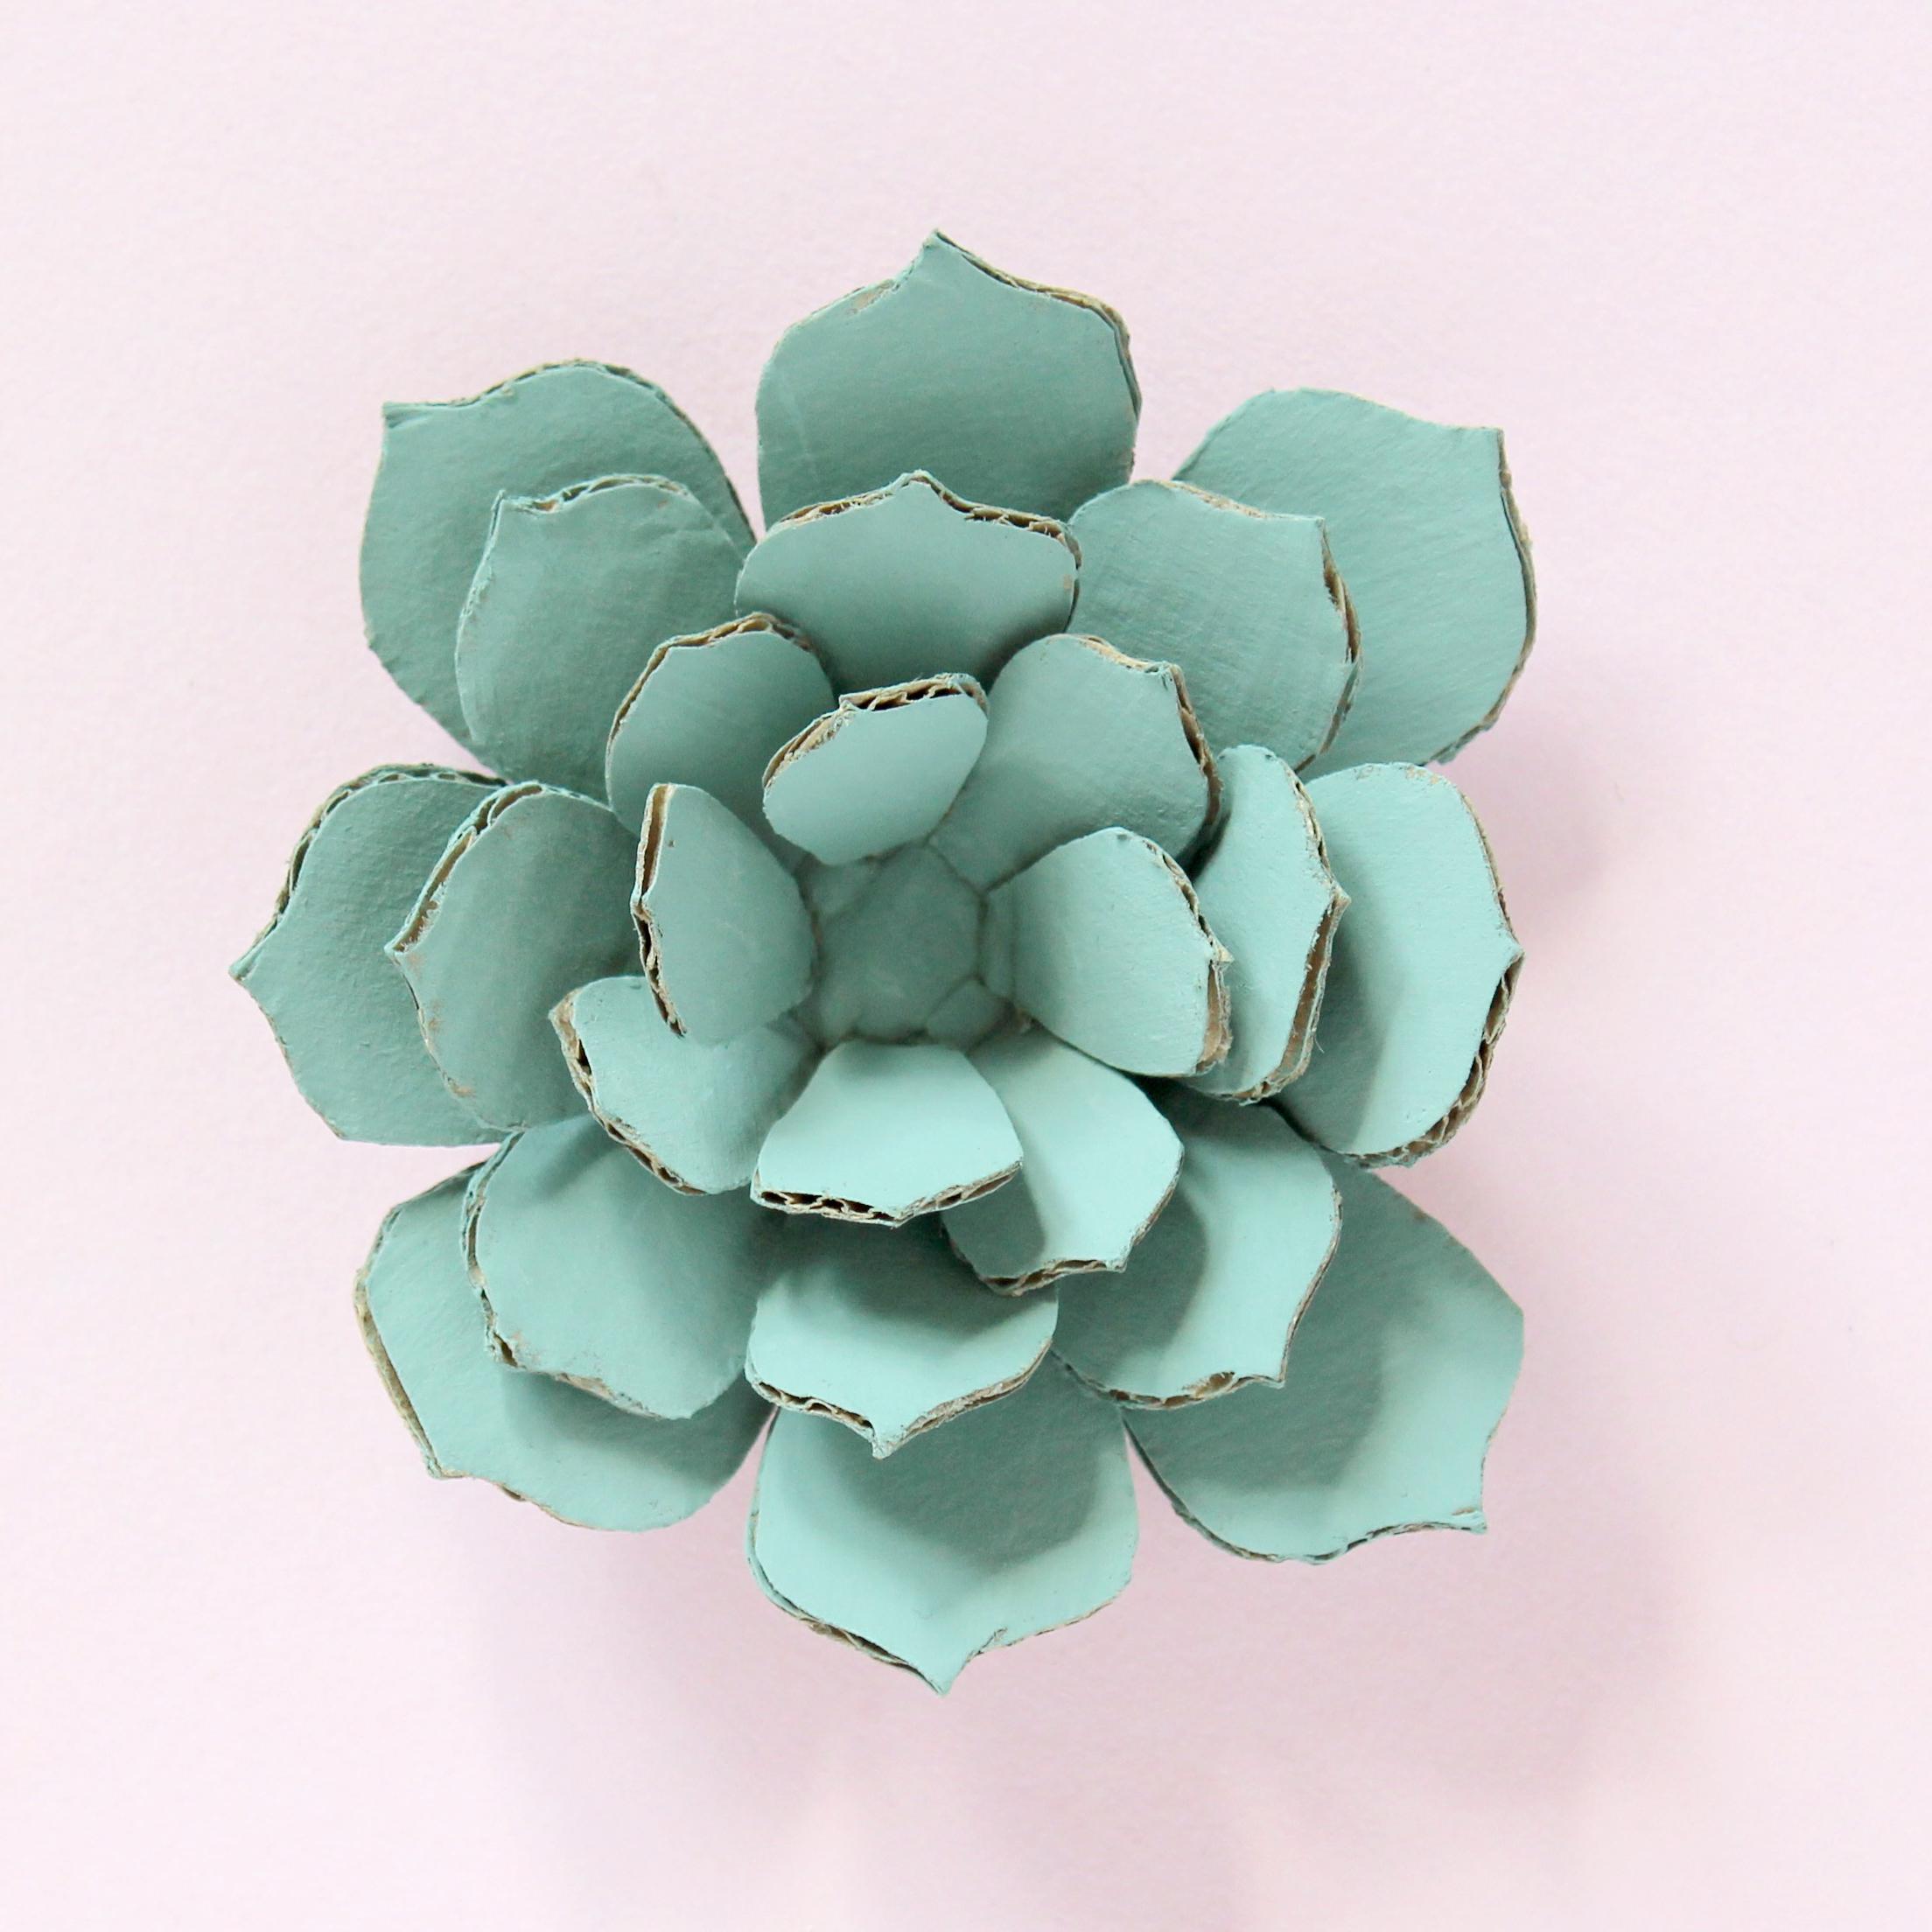 DIY Cardboard Paper Cactus and Succulents